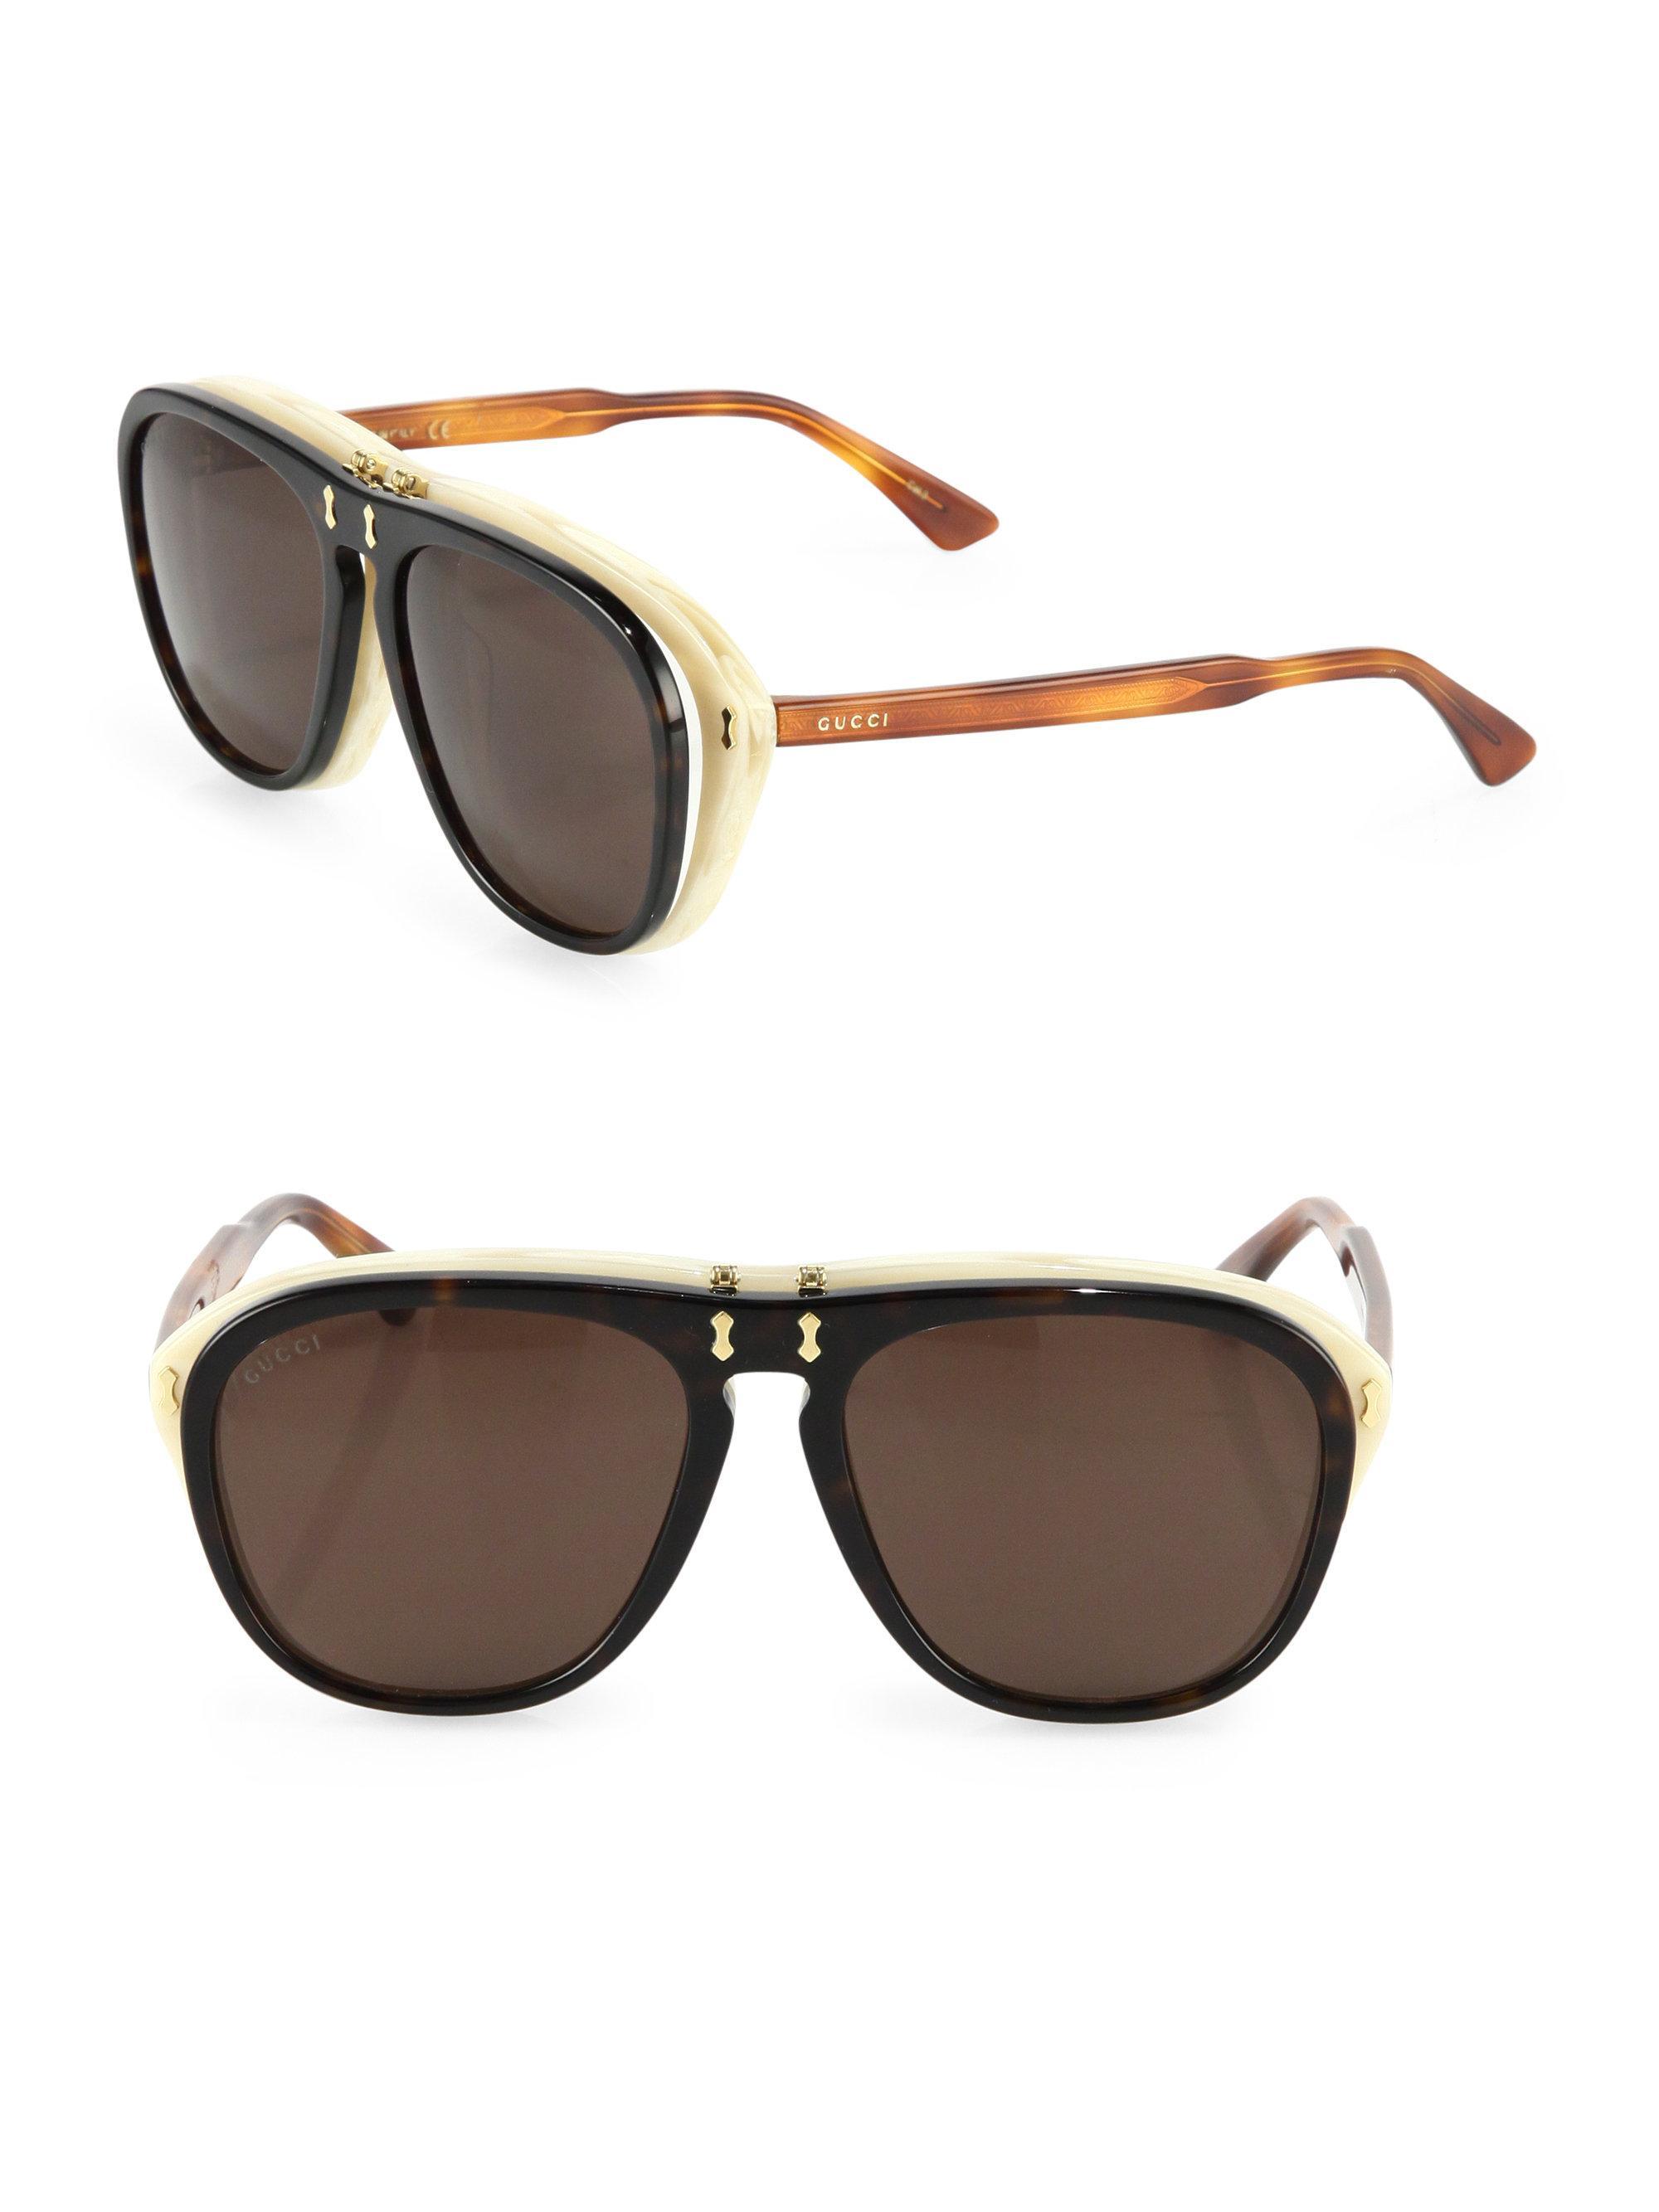 e45899e88 Gucci 56mm Flip-up Pilot Sunglasses for Men - Lyst